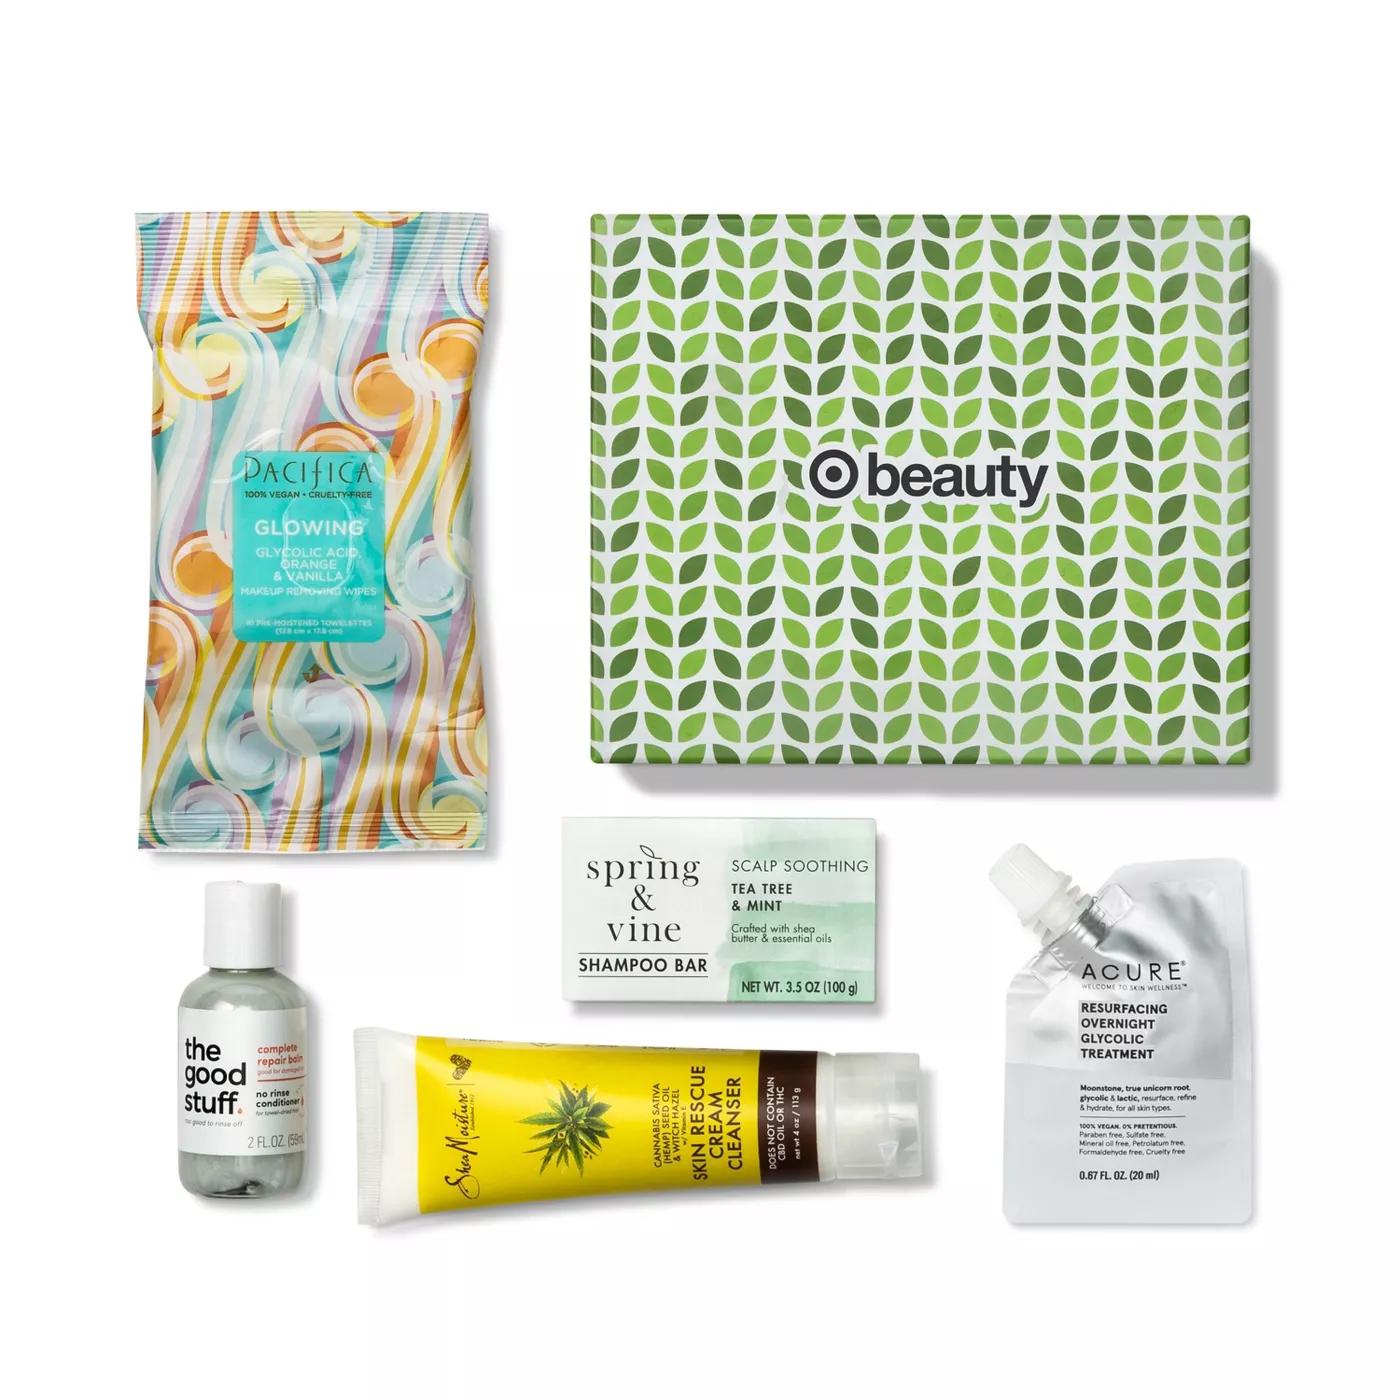 Target Beauty Box Beauty box, Witch hazel for skin